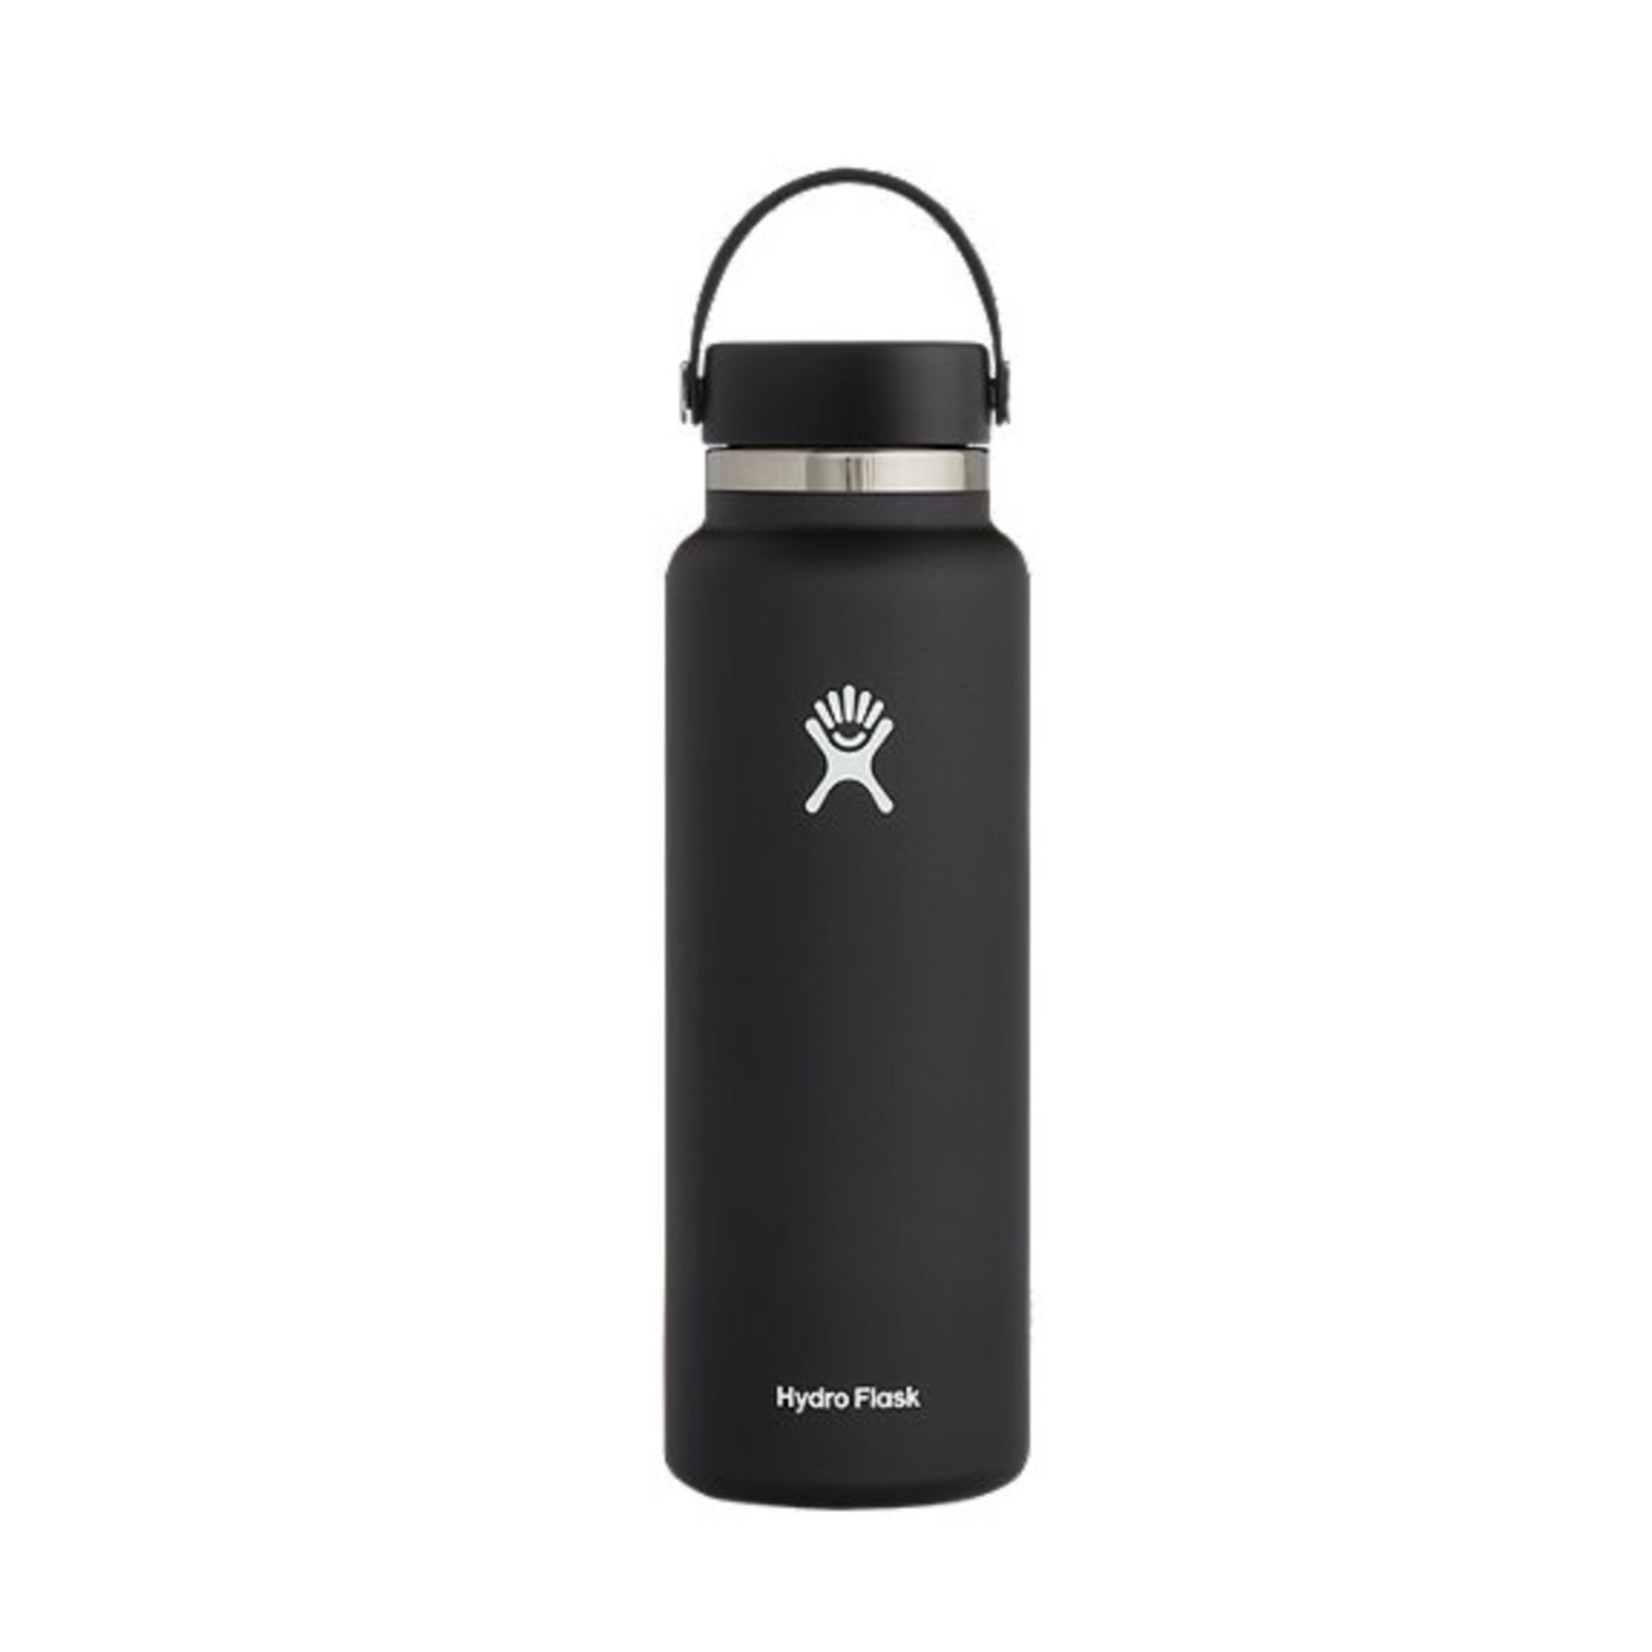 Hydro Flask Hydro Flask 40 oz. Wide Mouth w/ Flex Cap- Black